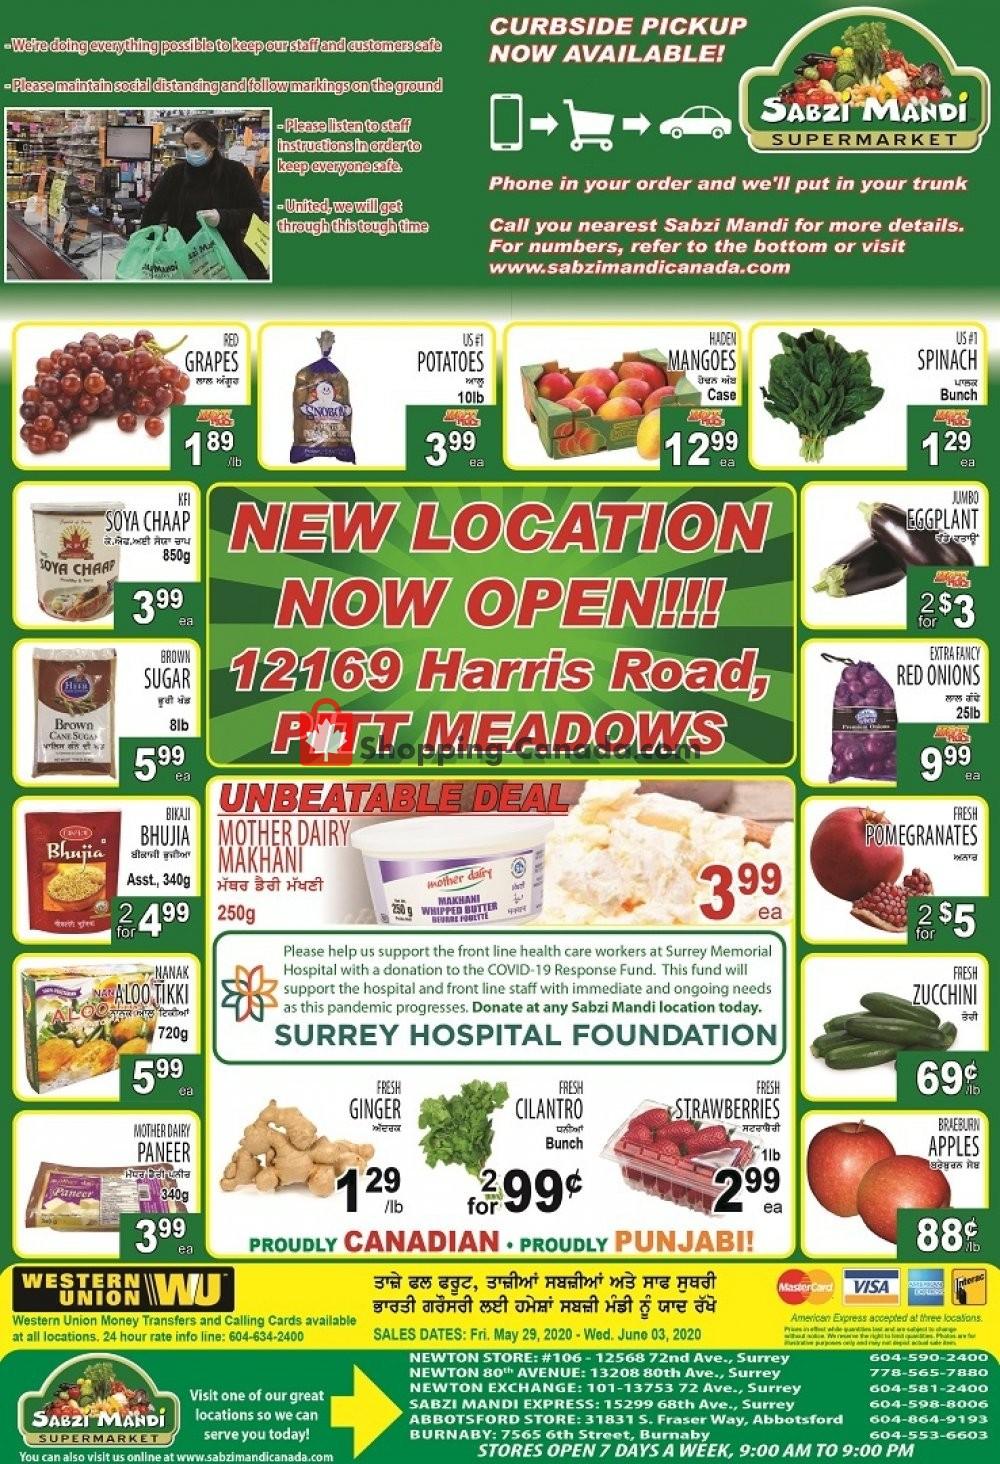 Flyer Sabzi Mandi Supermarket Canada - from Friday May 29, 2020 to Wednesday June 3, 2020